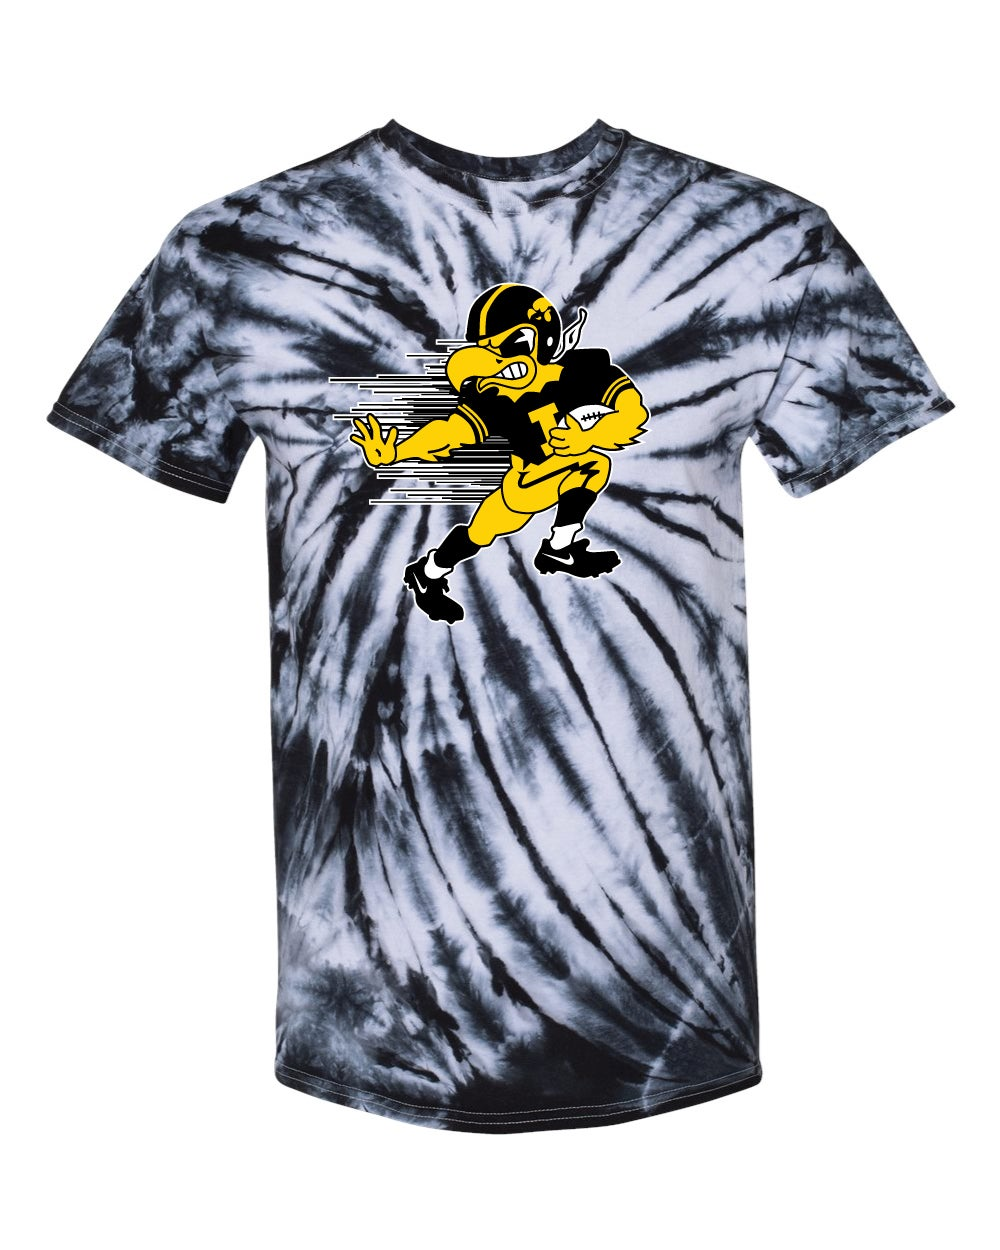 Image of Herk, How's Business? It's Zoomin'. (Tie Dye T-Shirt)